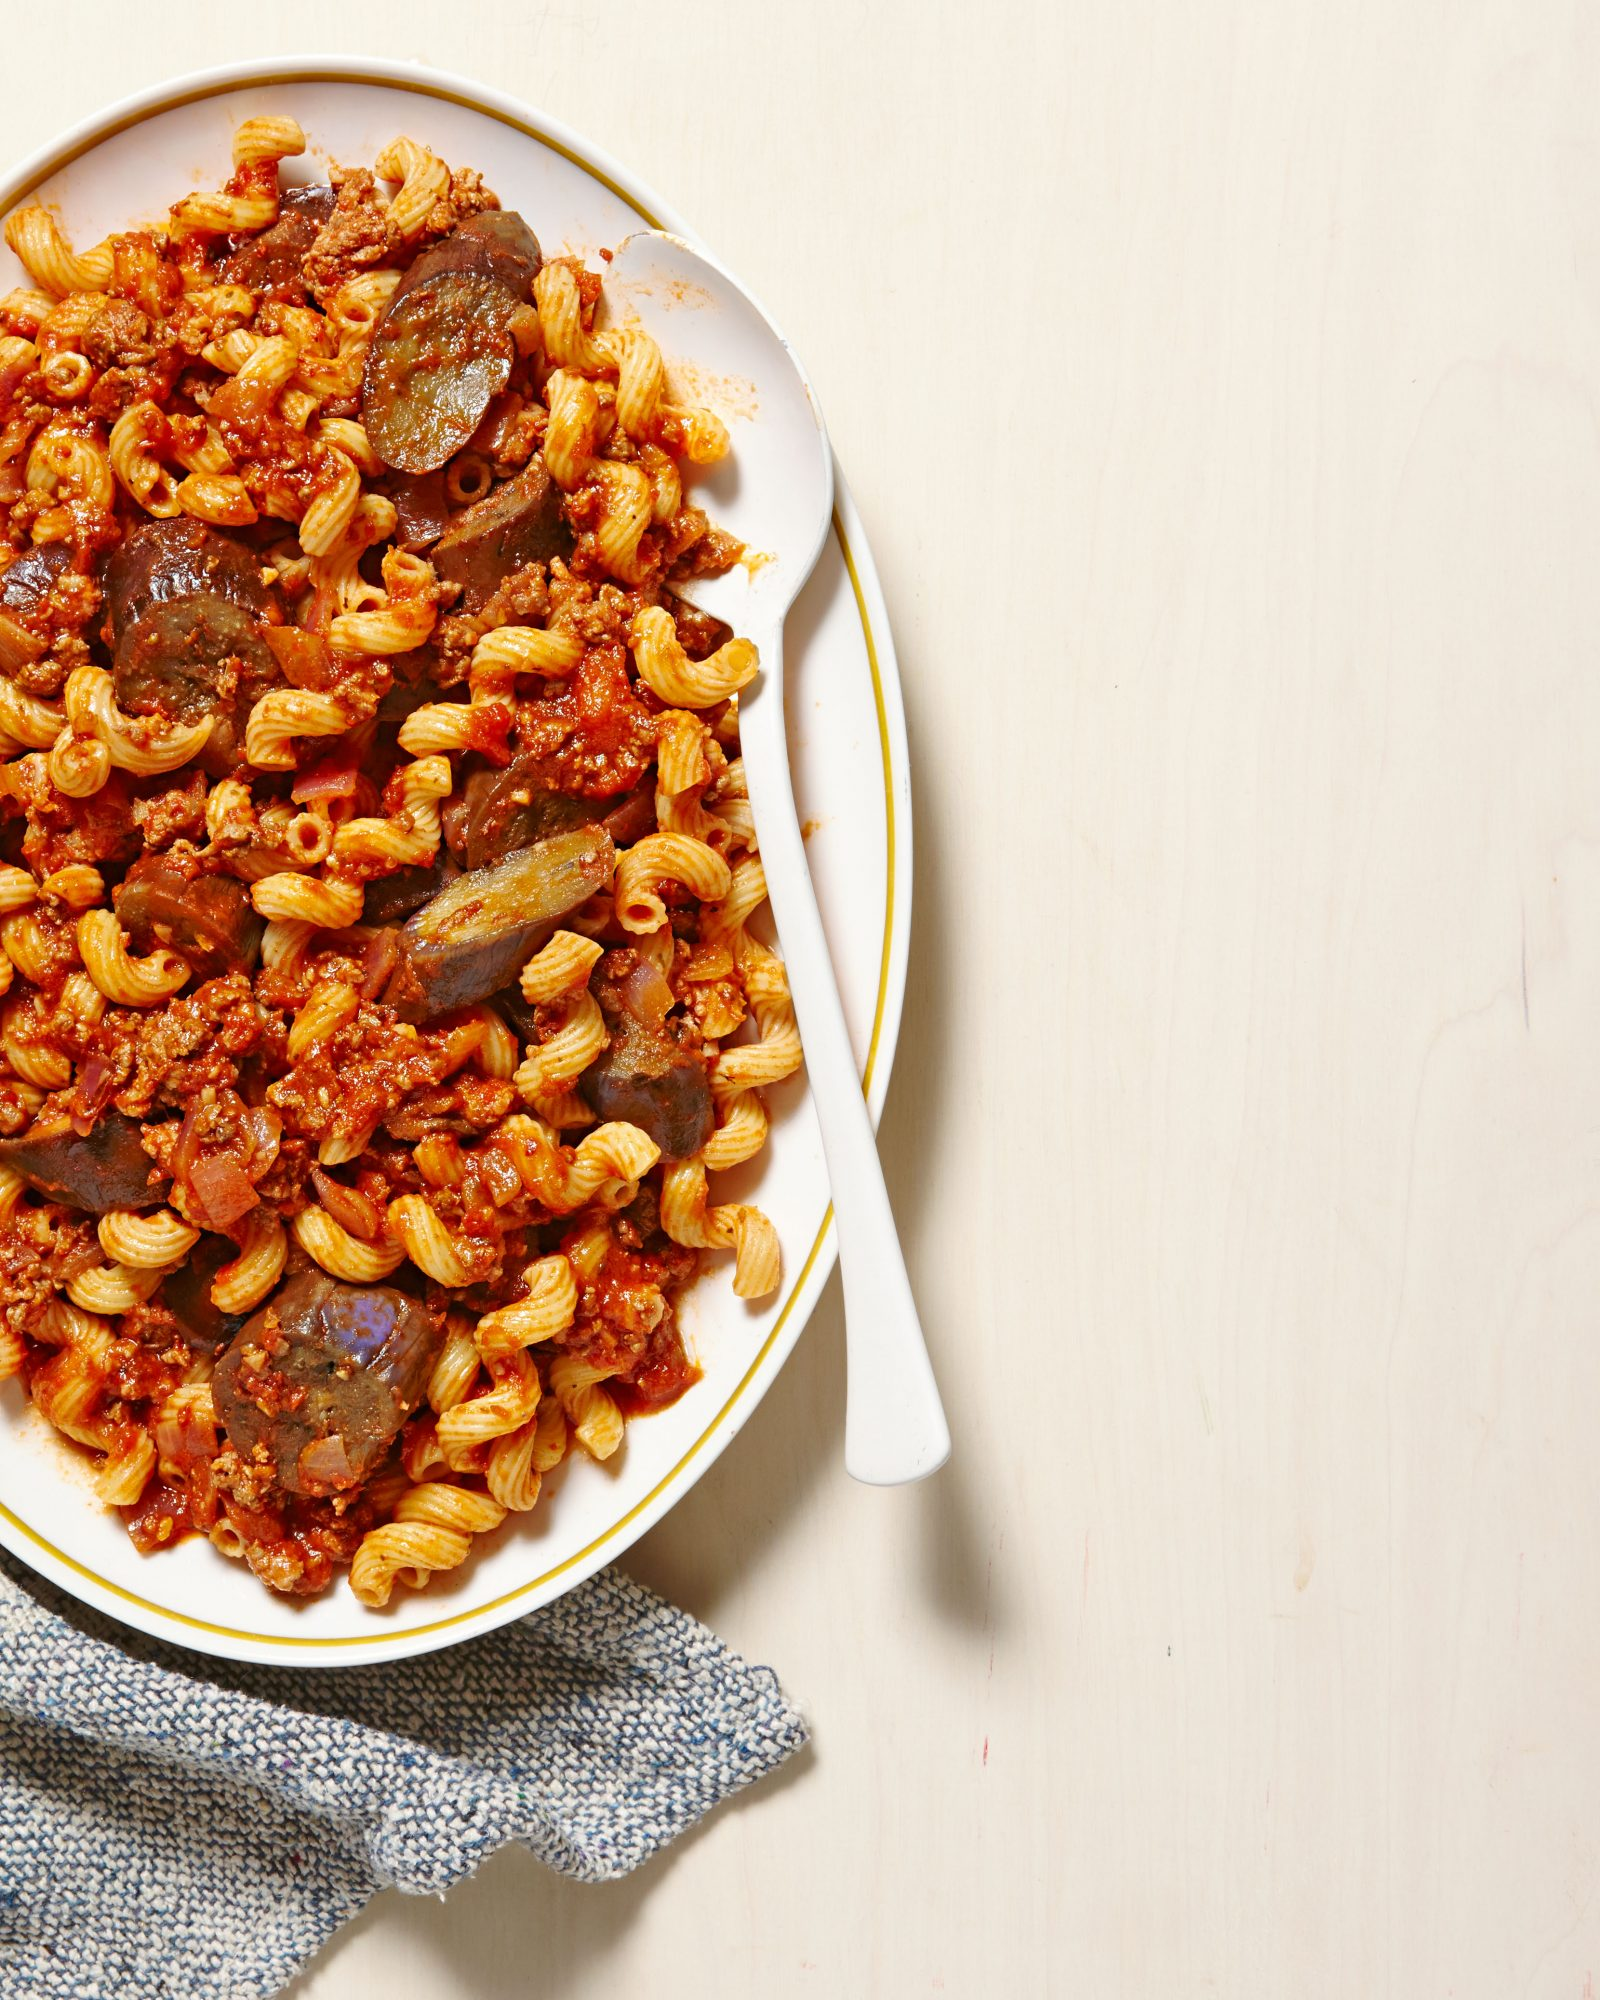 Lamb & Eggplant Ragu with Pasta